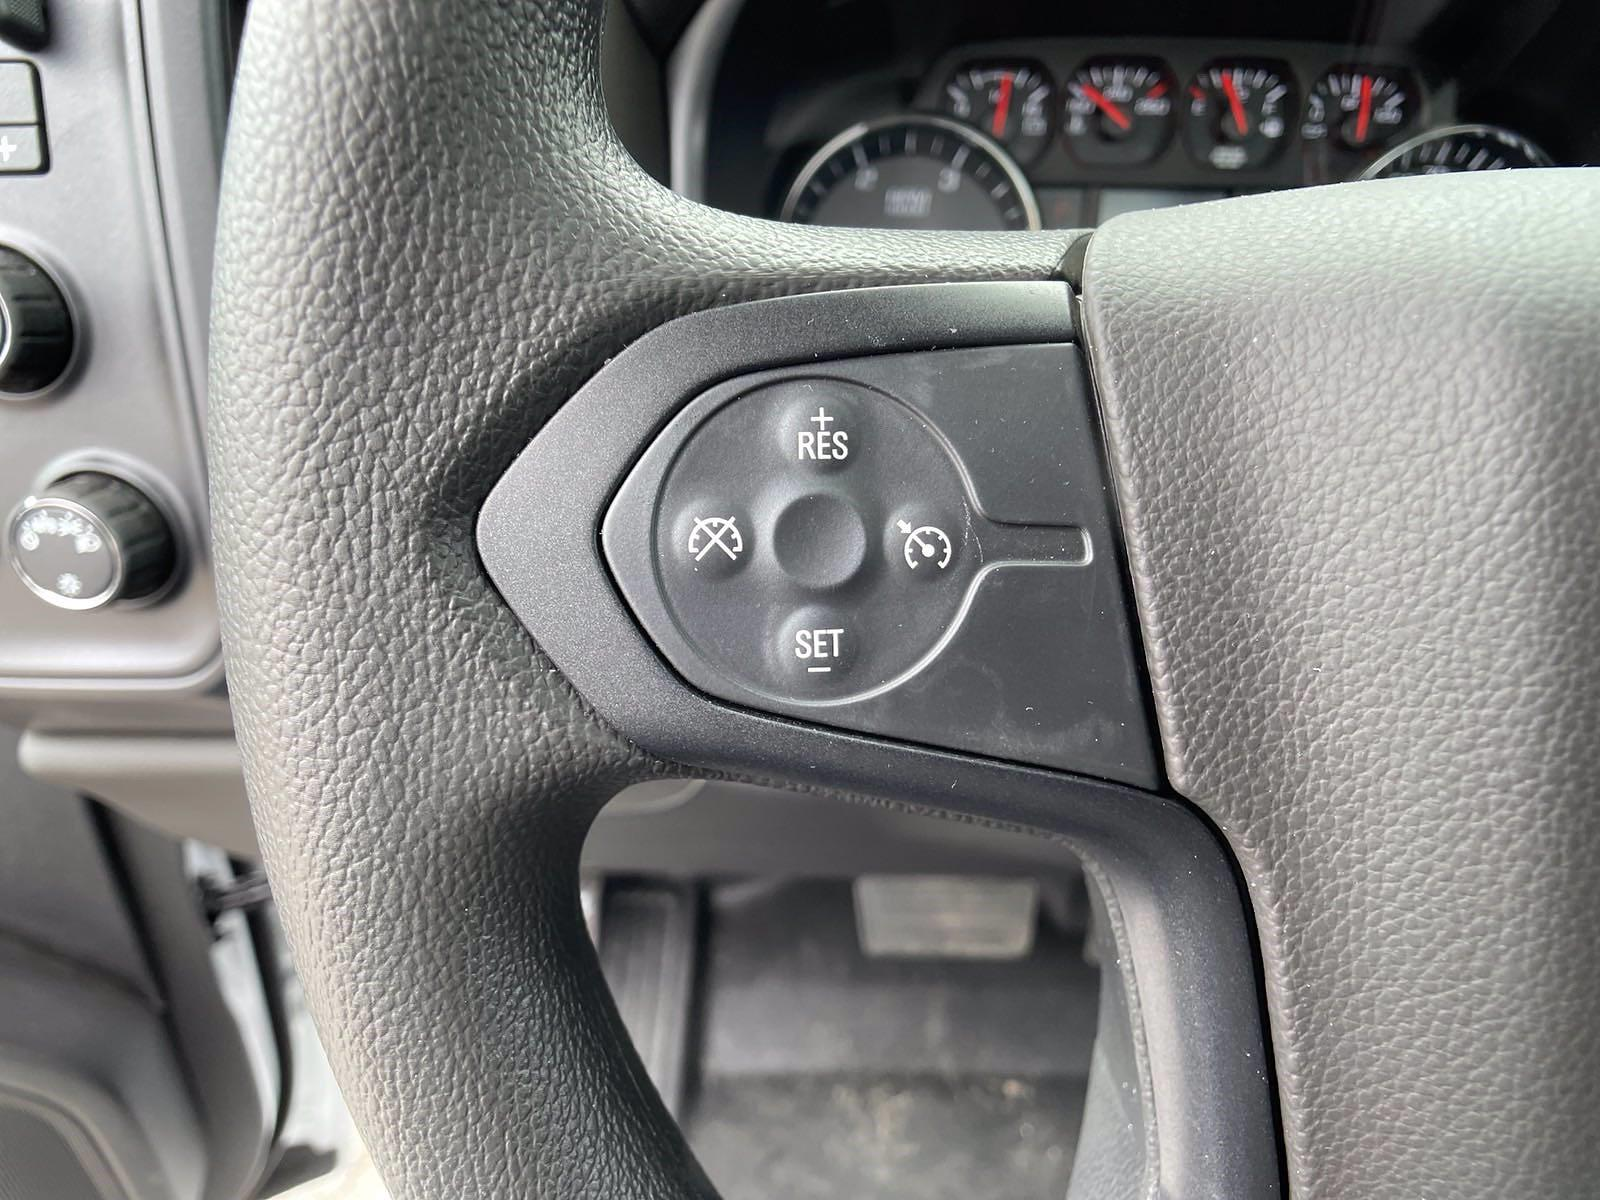 2020 Silverado 5500 Regular Cab DRW 4x4,  Reading Service Body #MD0041 - photo 11